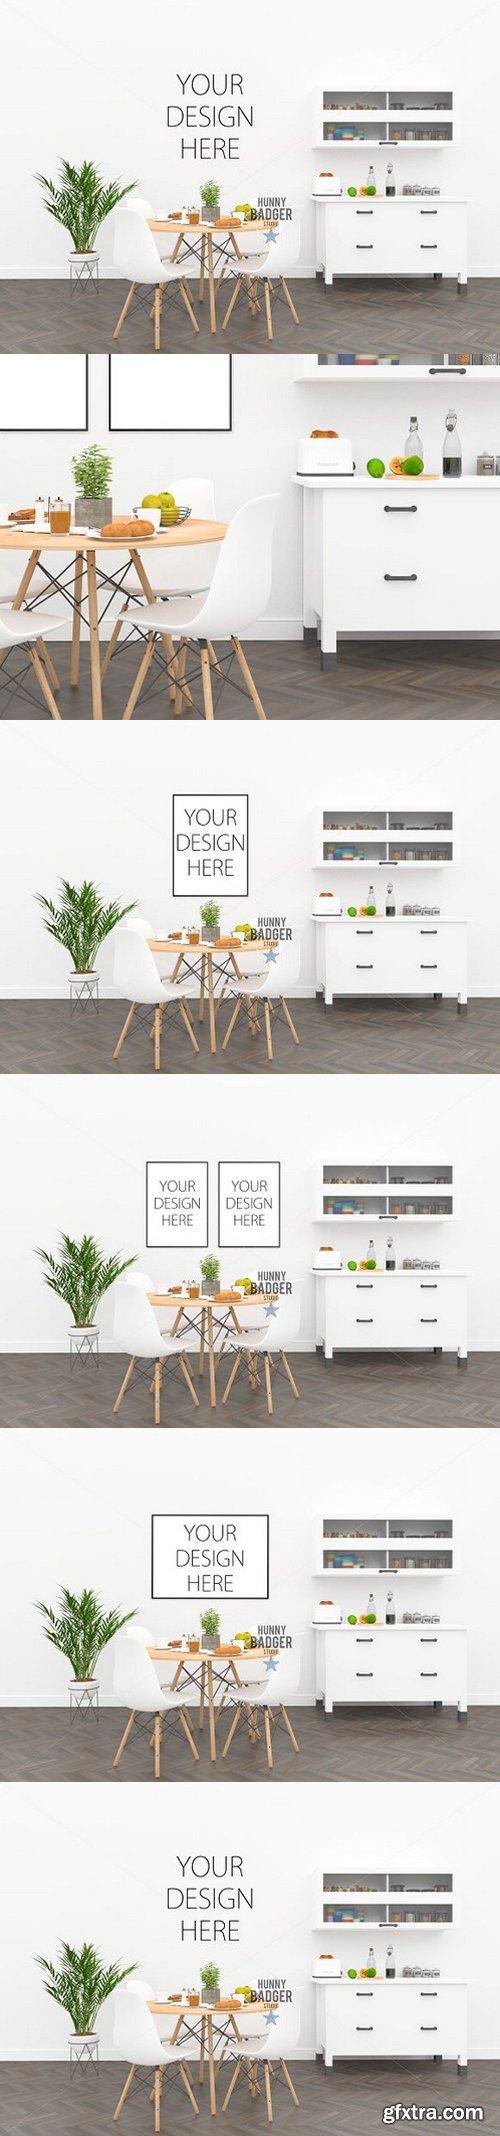 CM - Poster mockup - kitchen mockup 1516168